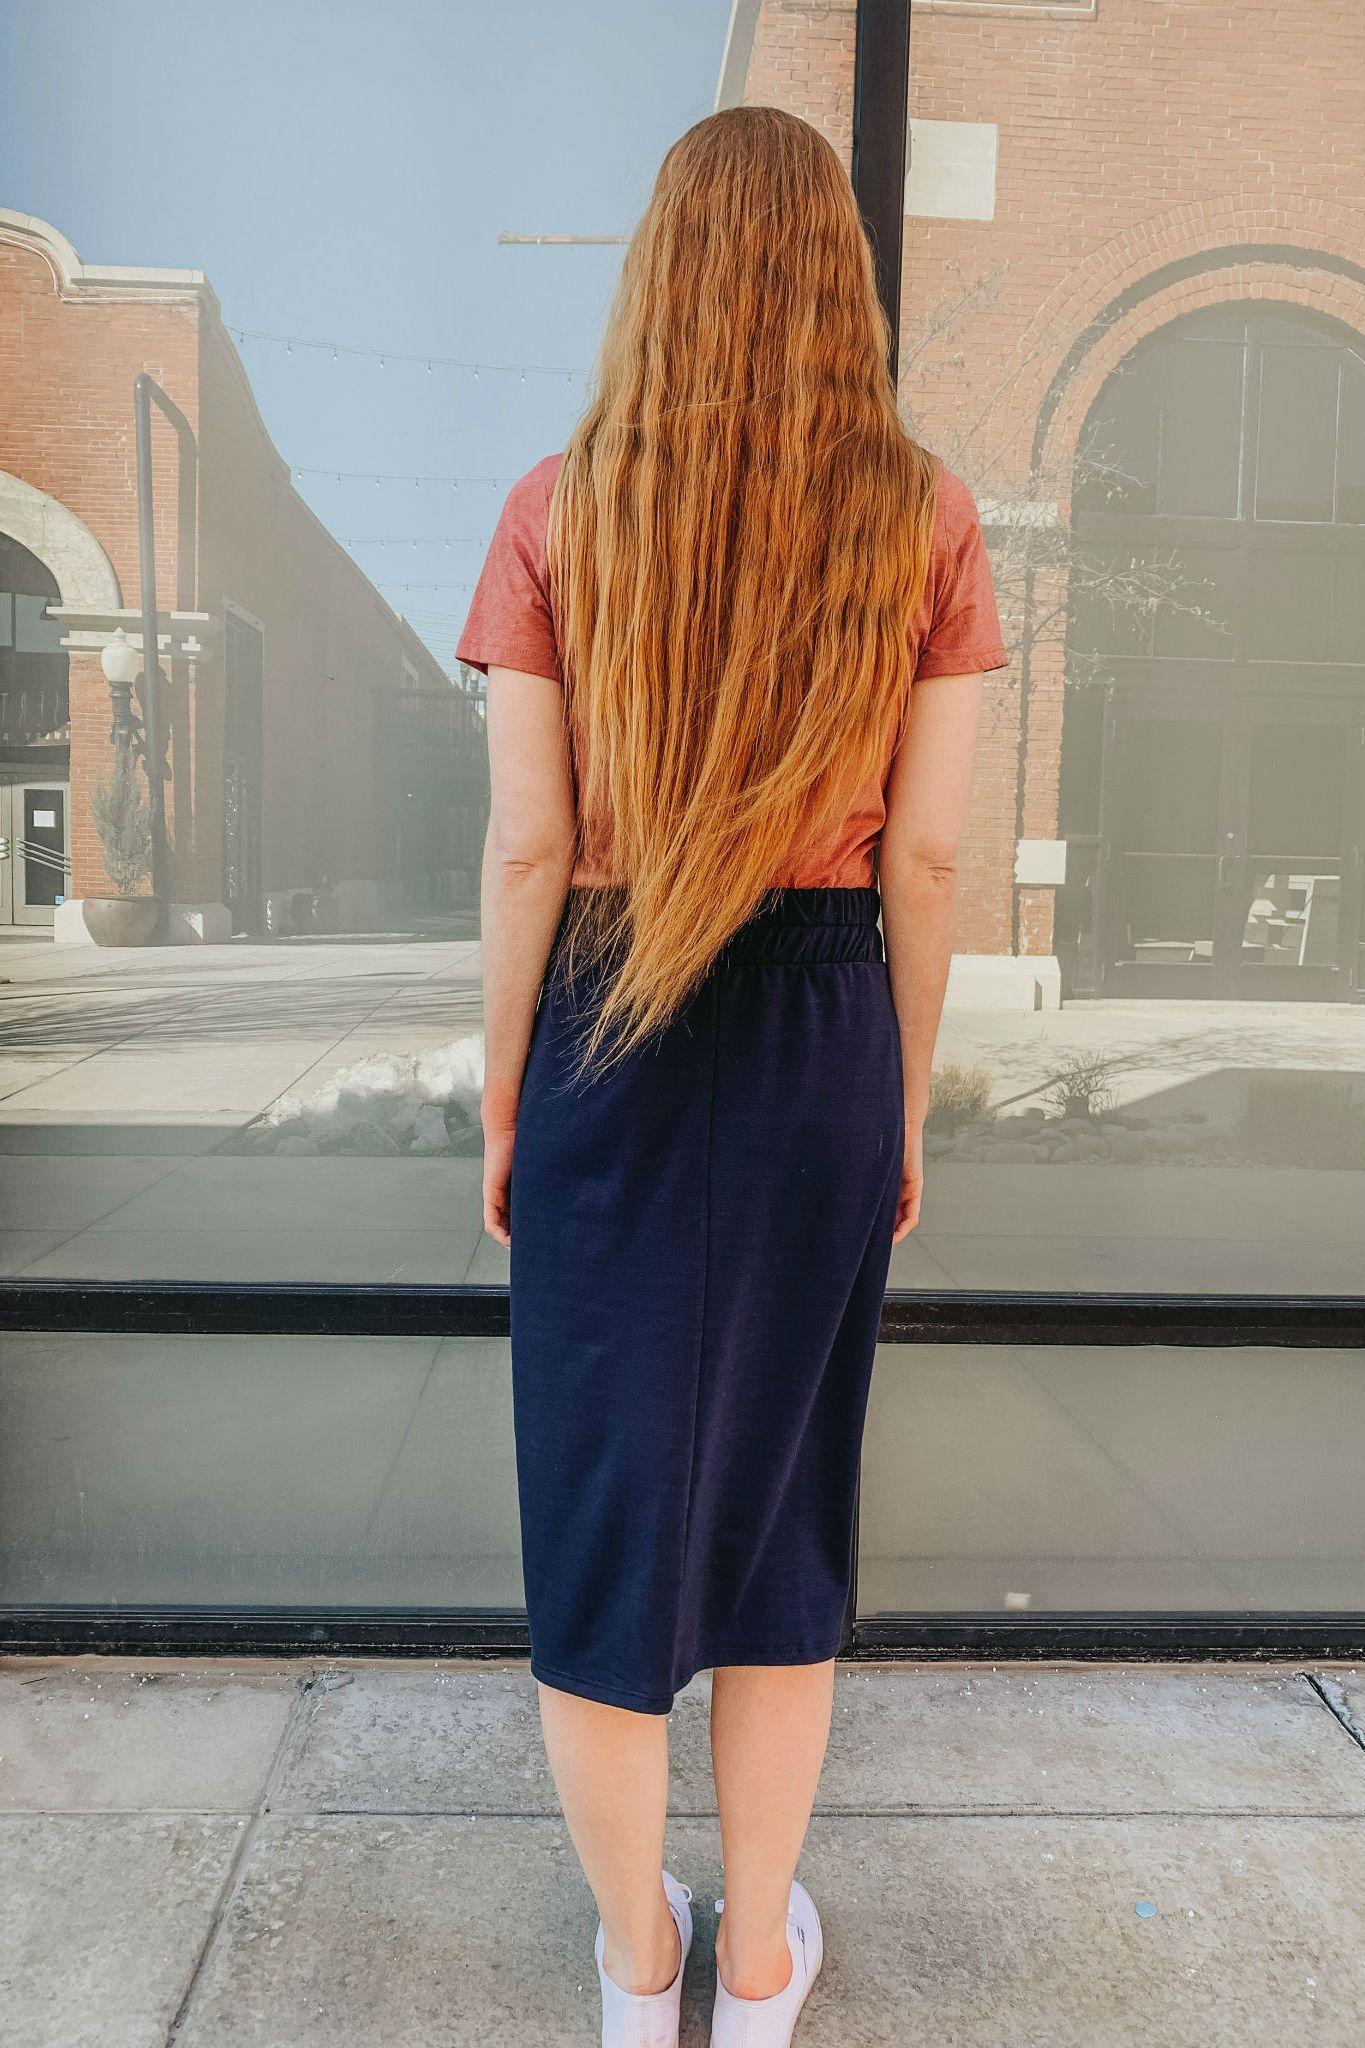 41dcf7d8515 Chloe Jersey Skirt in Navy – CLEO MADISON